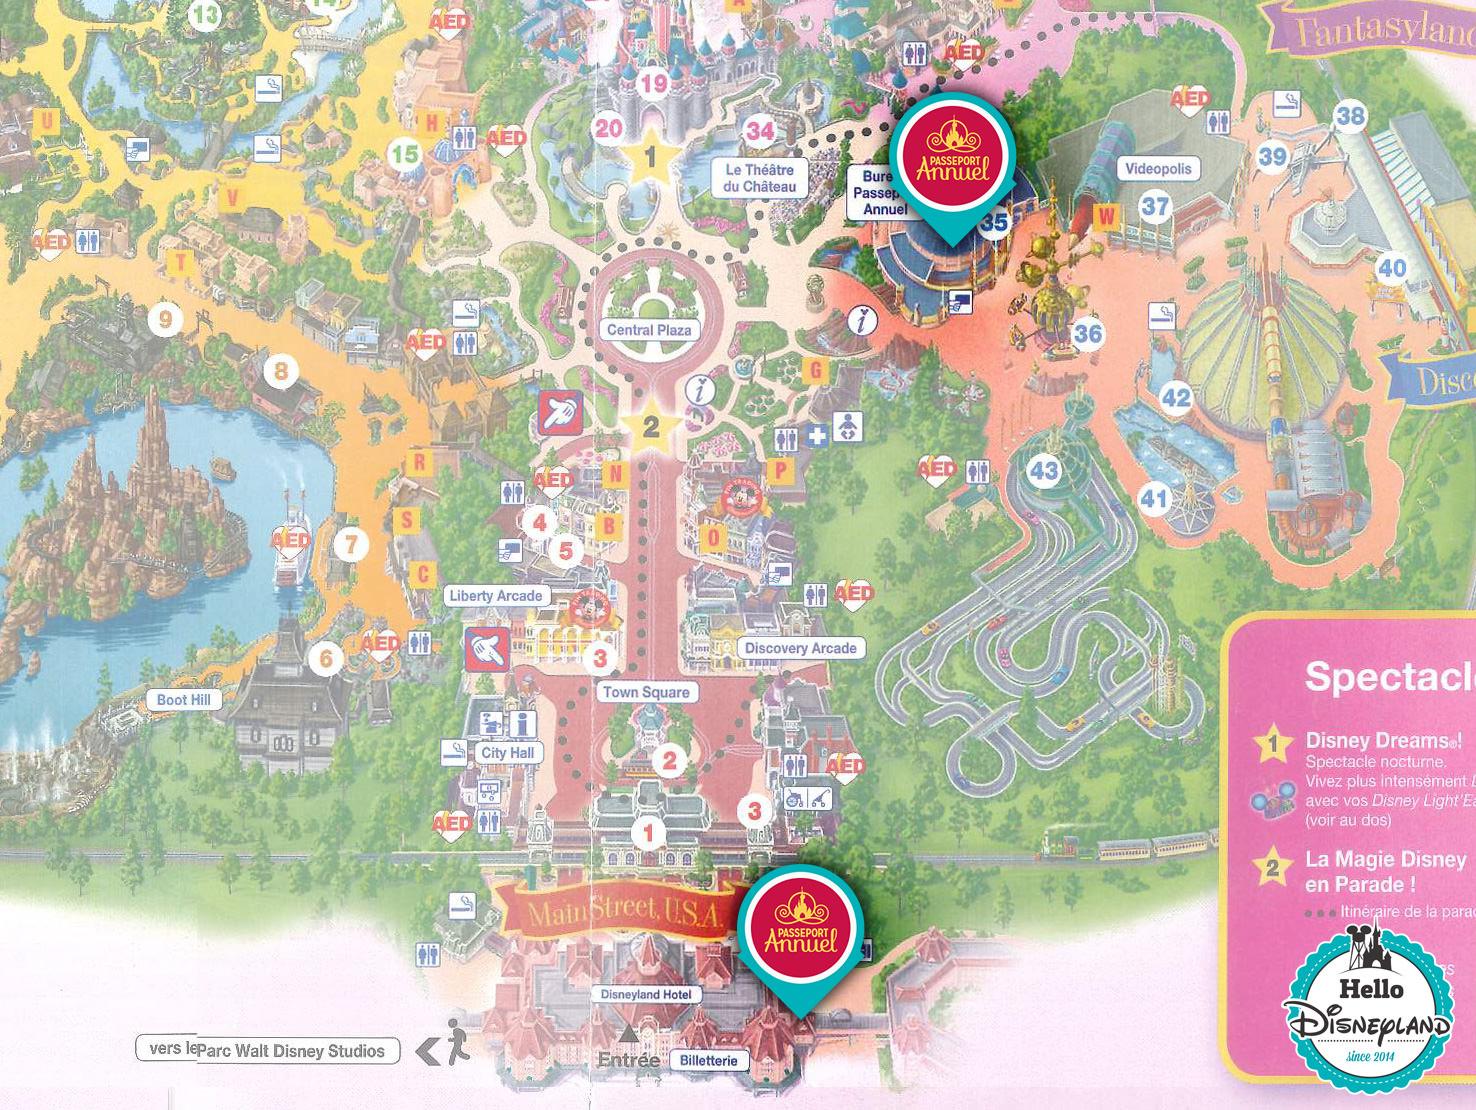 Hello Disneyland Le Blog N 1 Sur Disneyland Paris Bureau Des